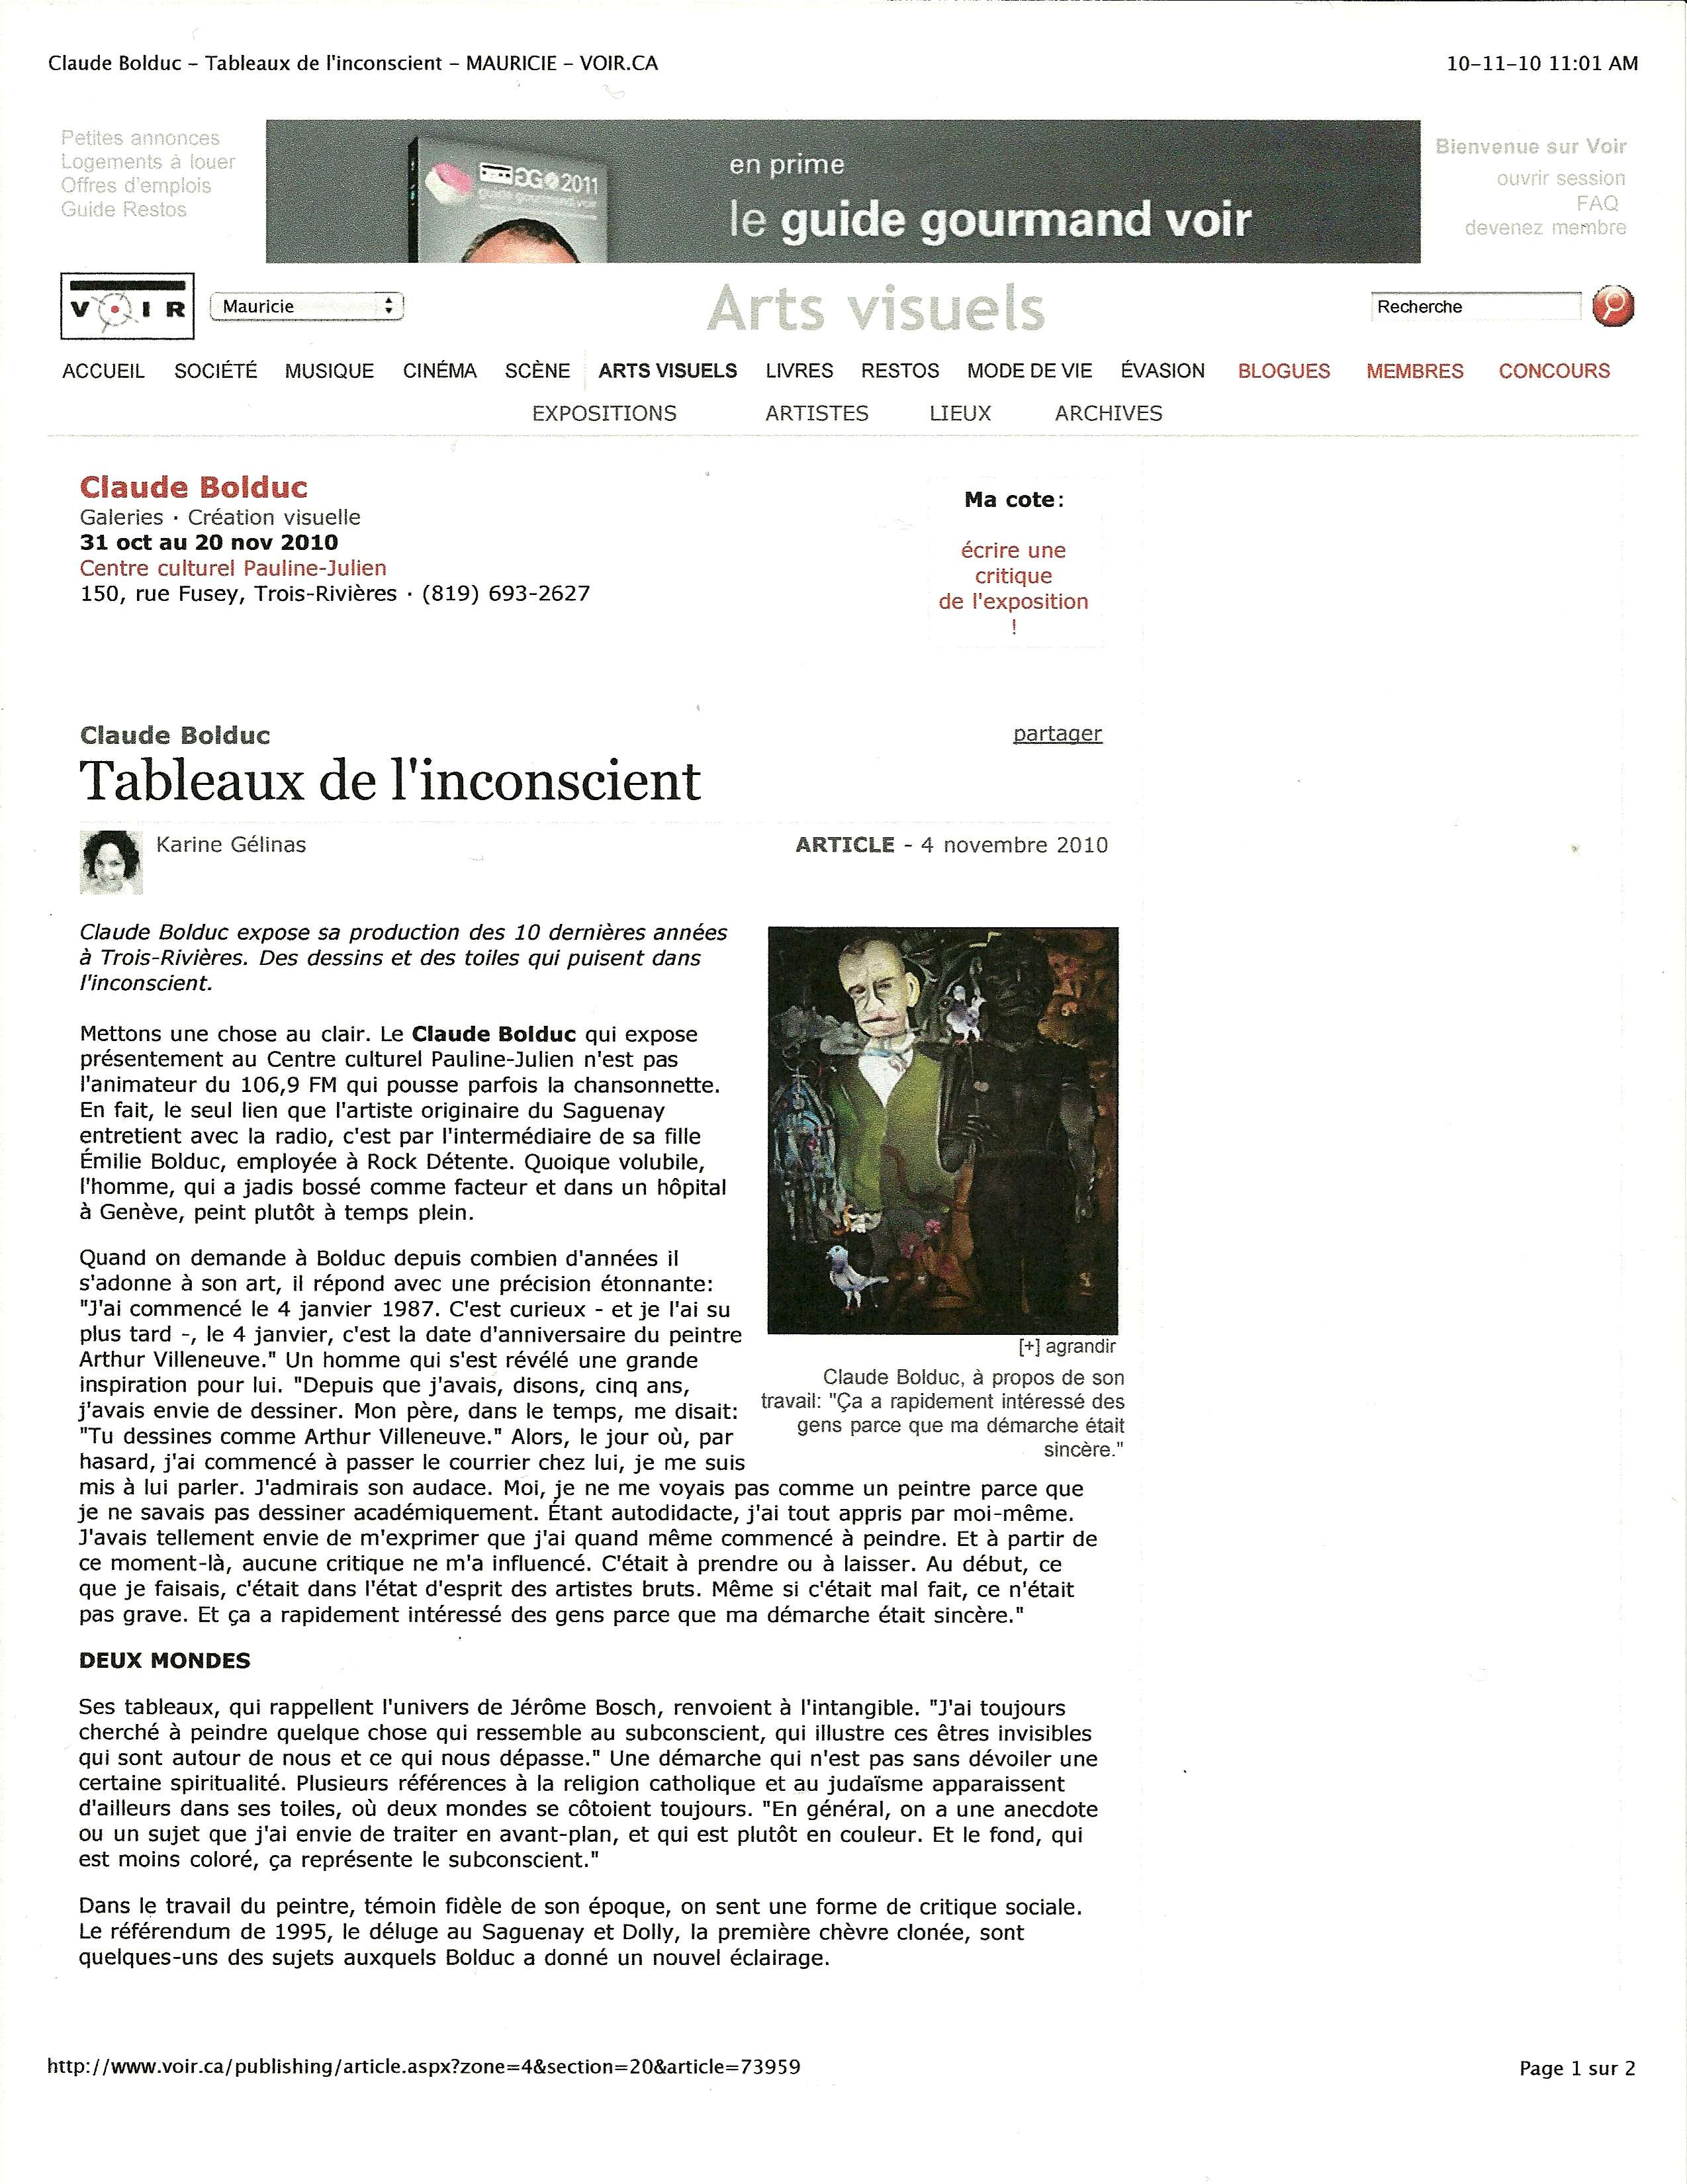 Article journal VOIR (2010)